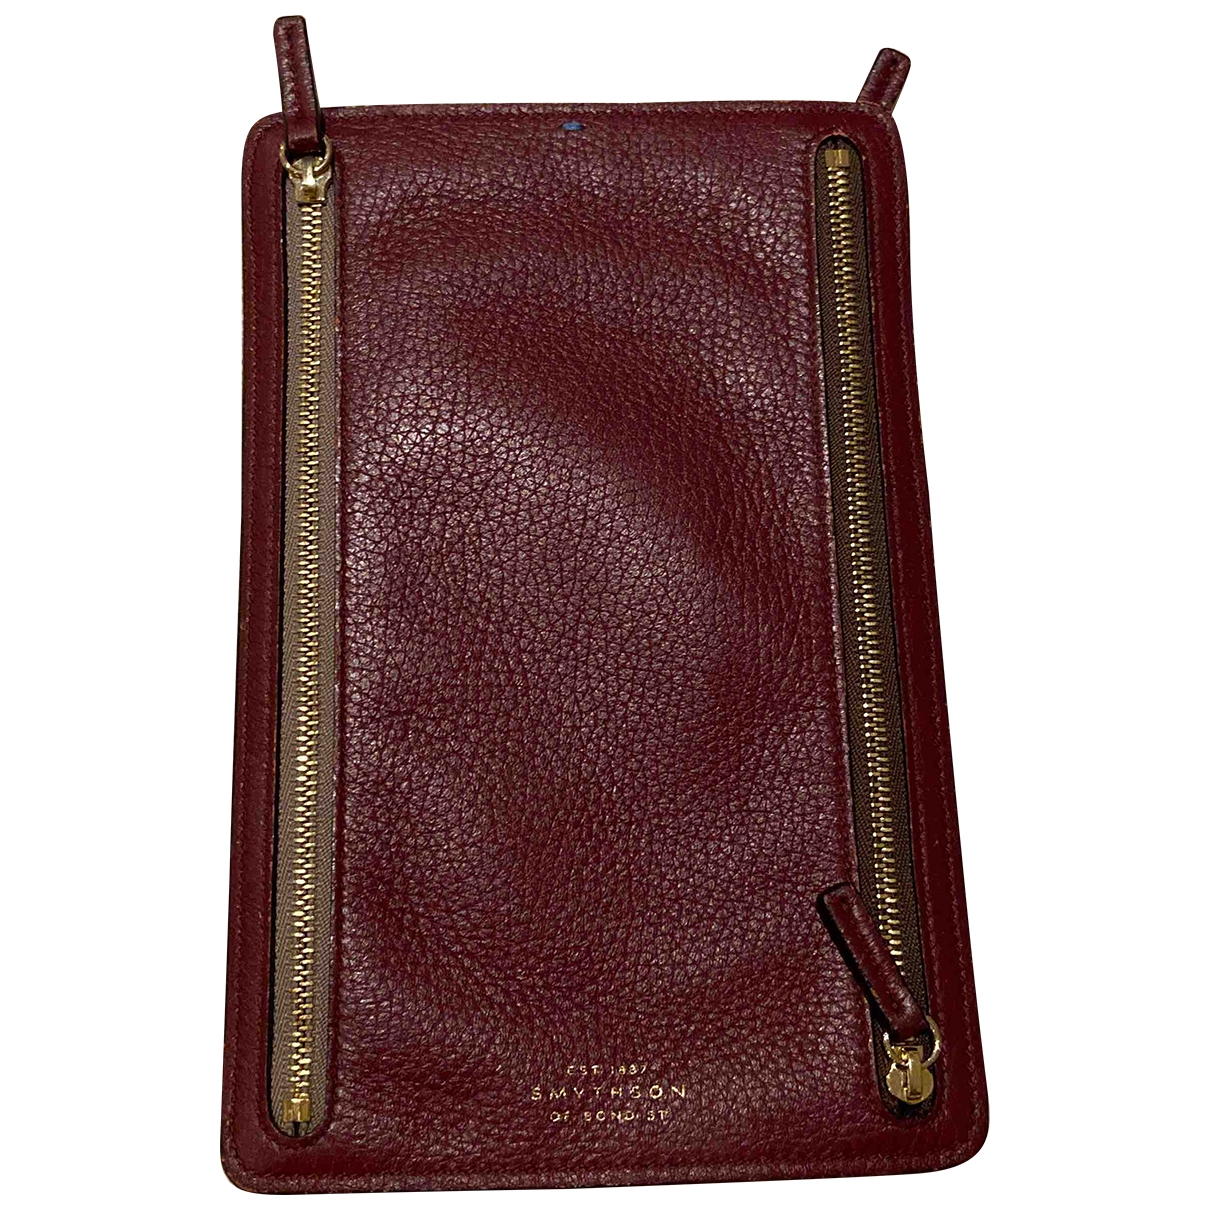 Smythson \N Burgundy Leather Purses, wallet & cases for Women \N